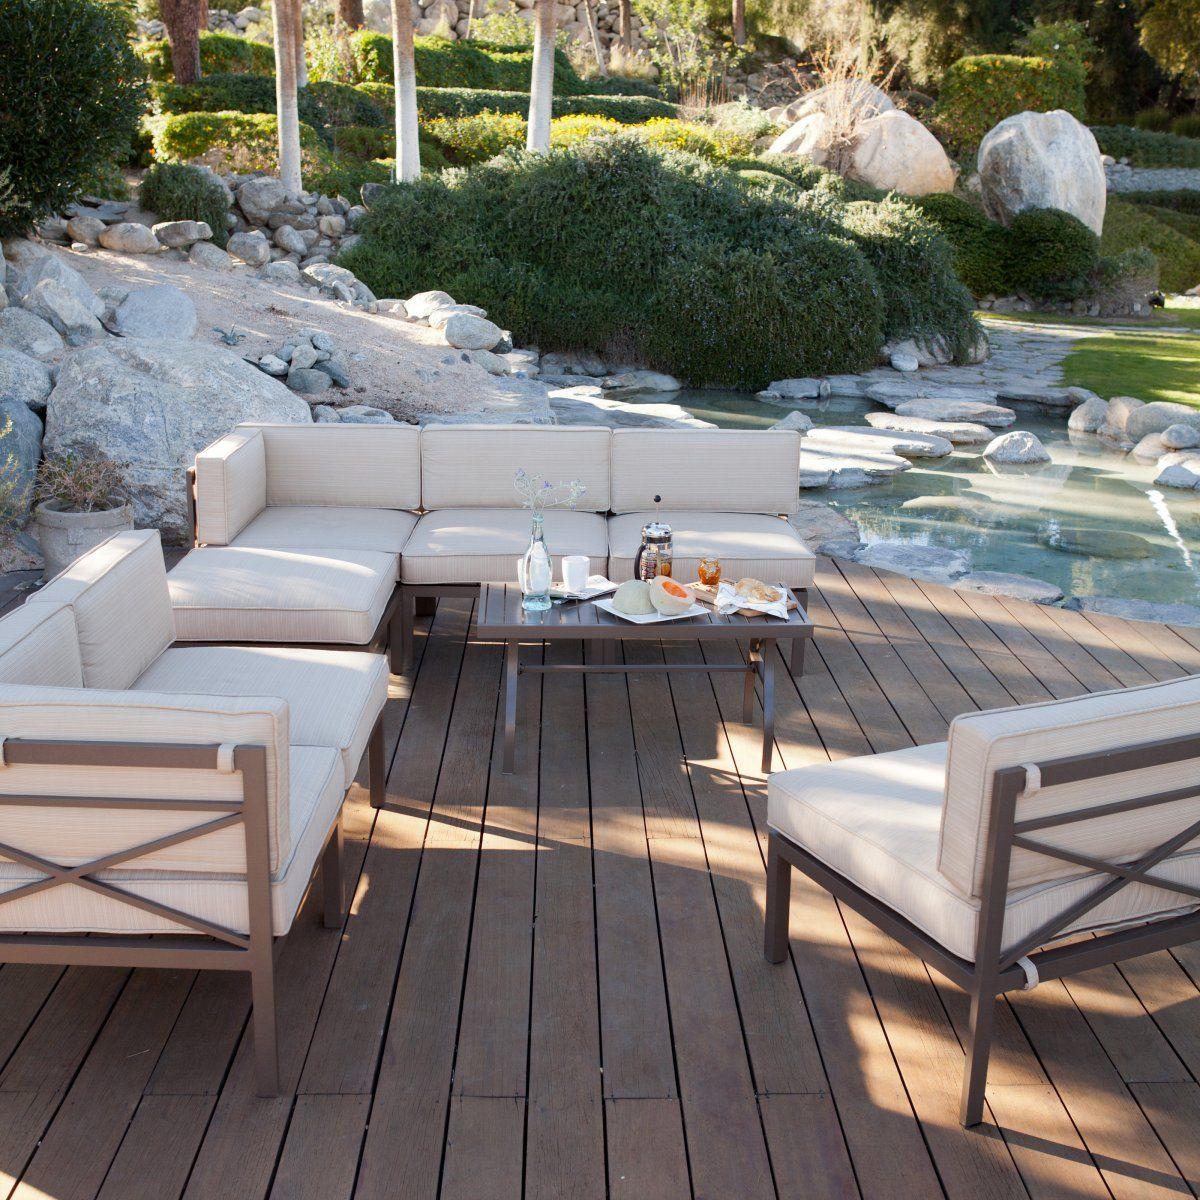 Bellagio 10 pc. Aluminum Sectional Sofa Set - Seats 8 - Conversation ...